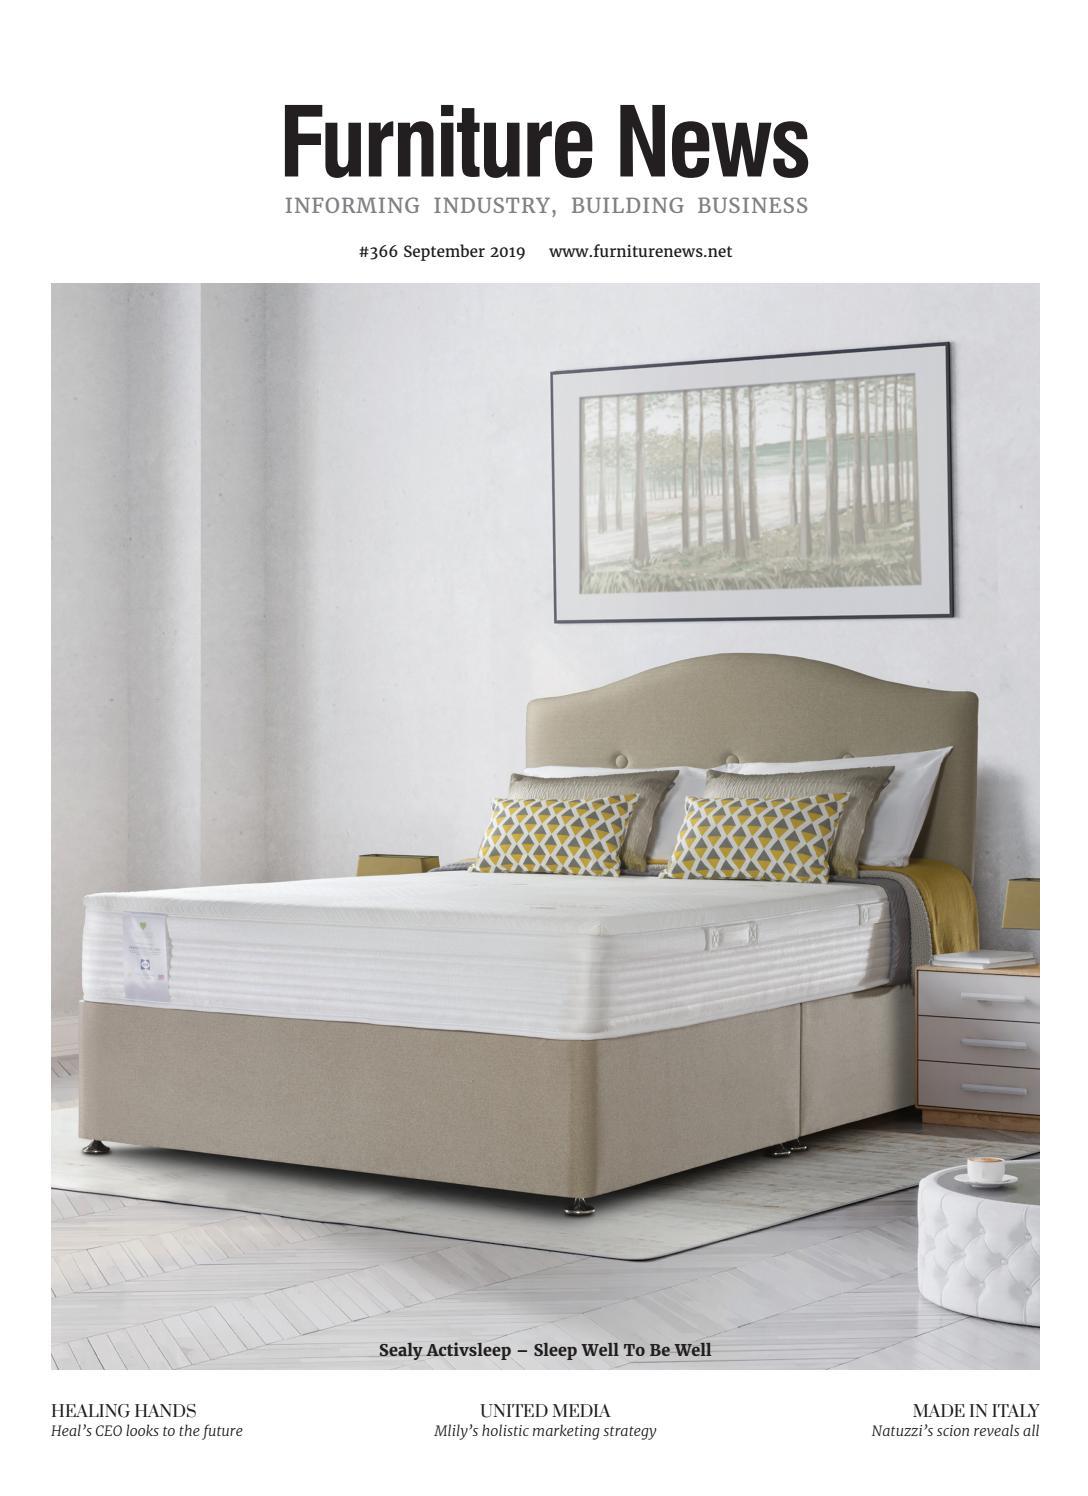 Kess InHouse House Plants Bed Runner 34 x 86